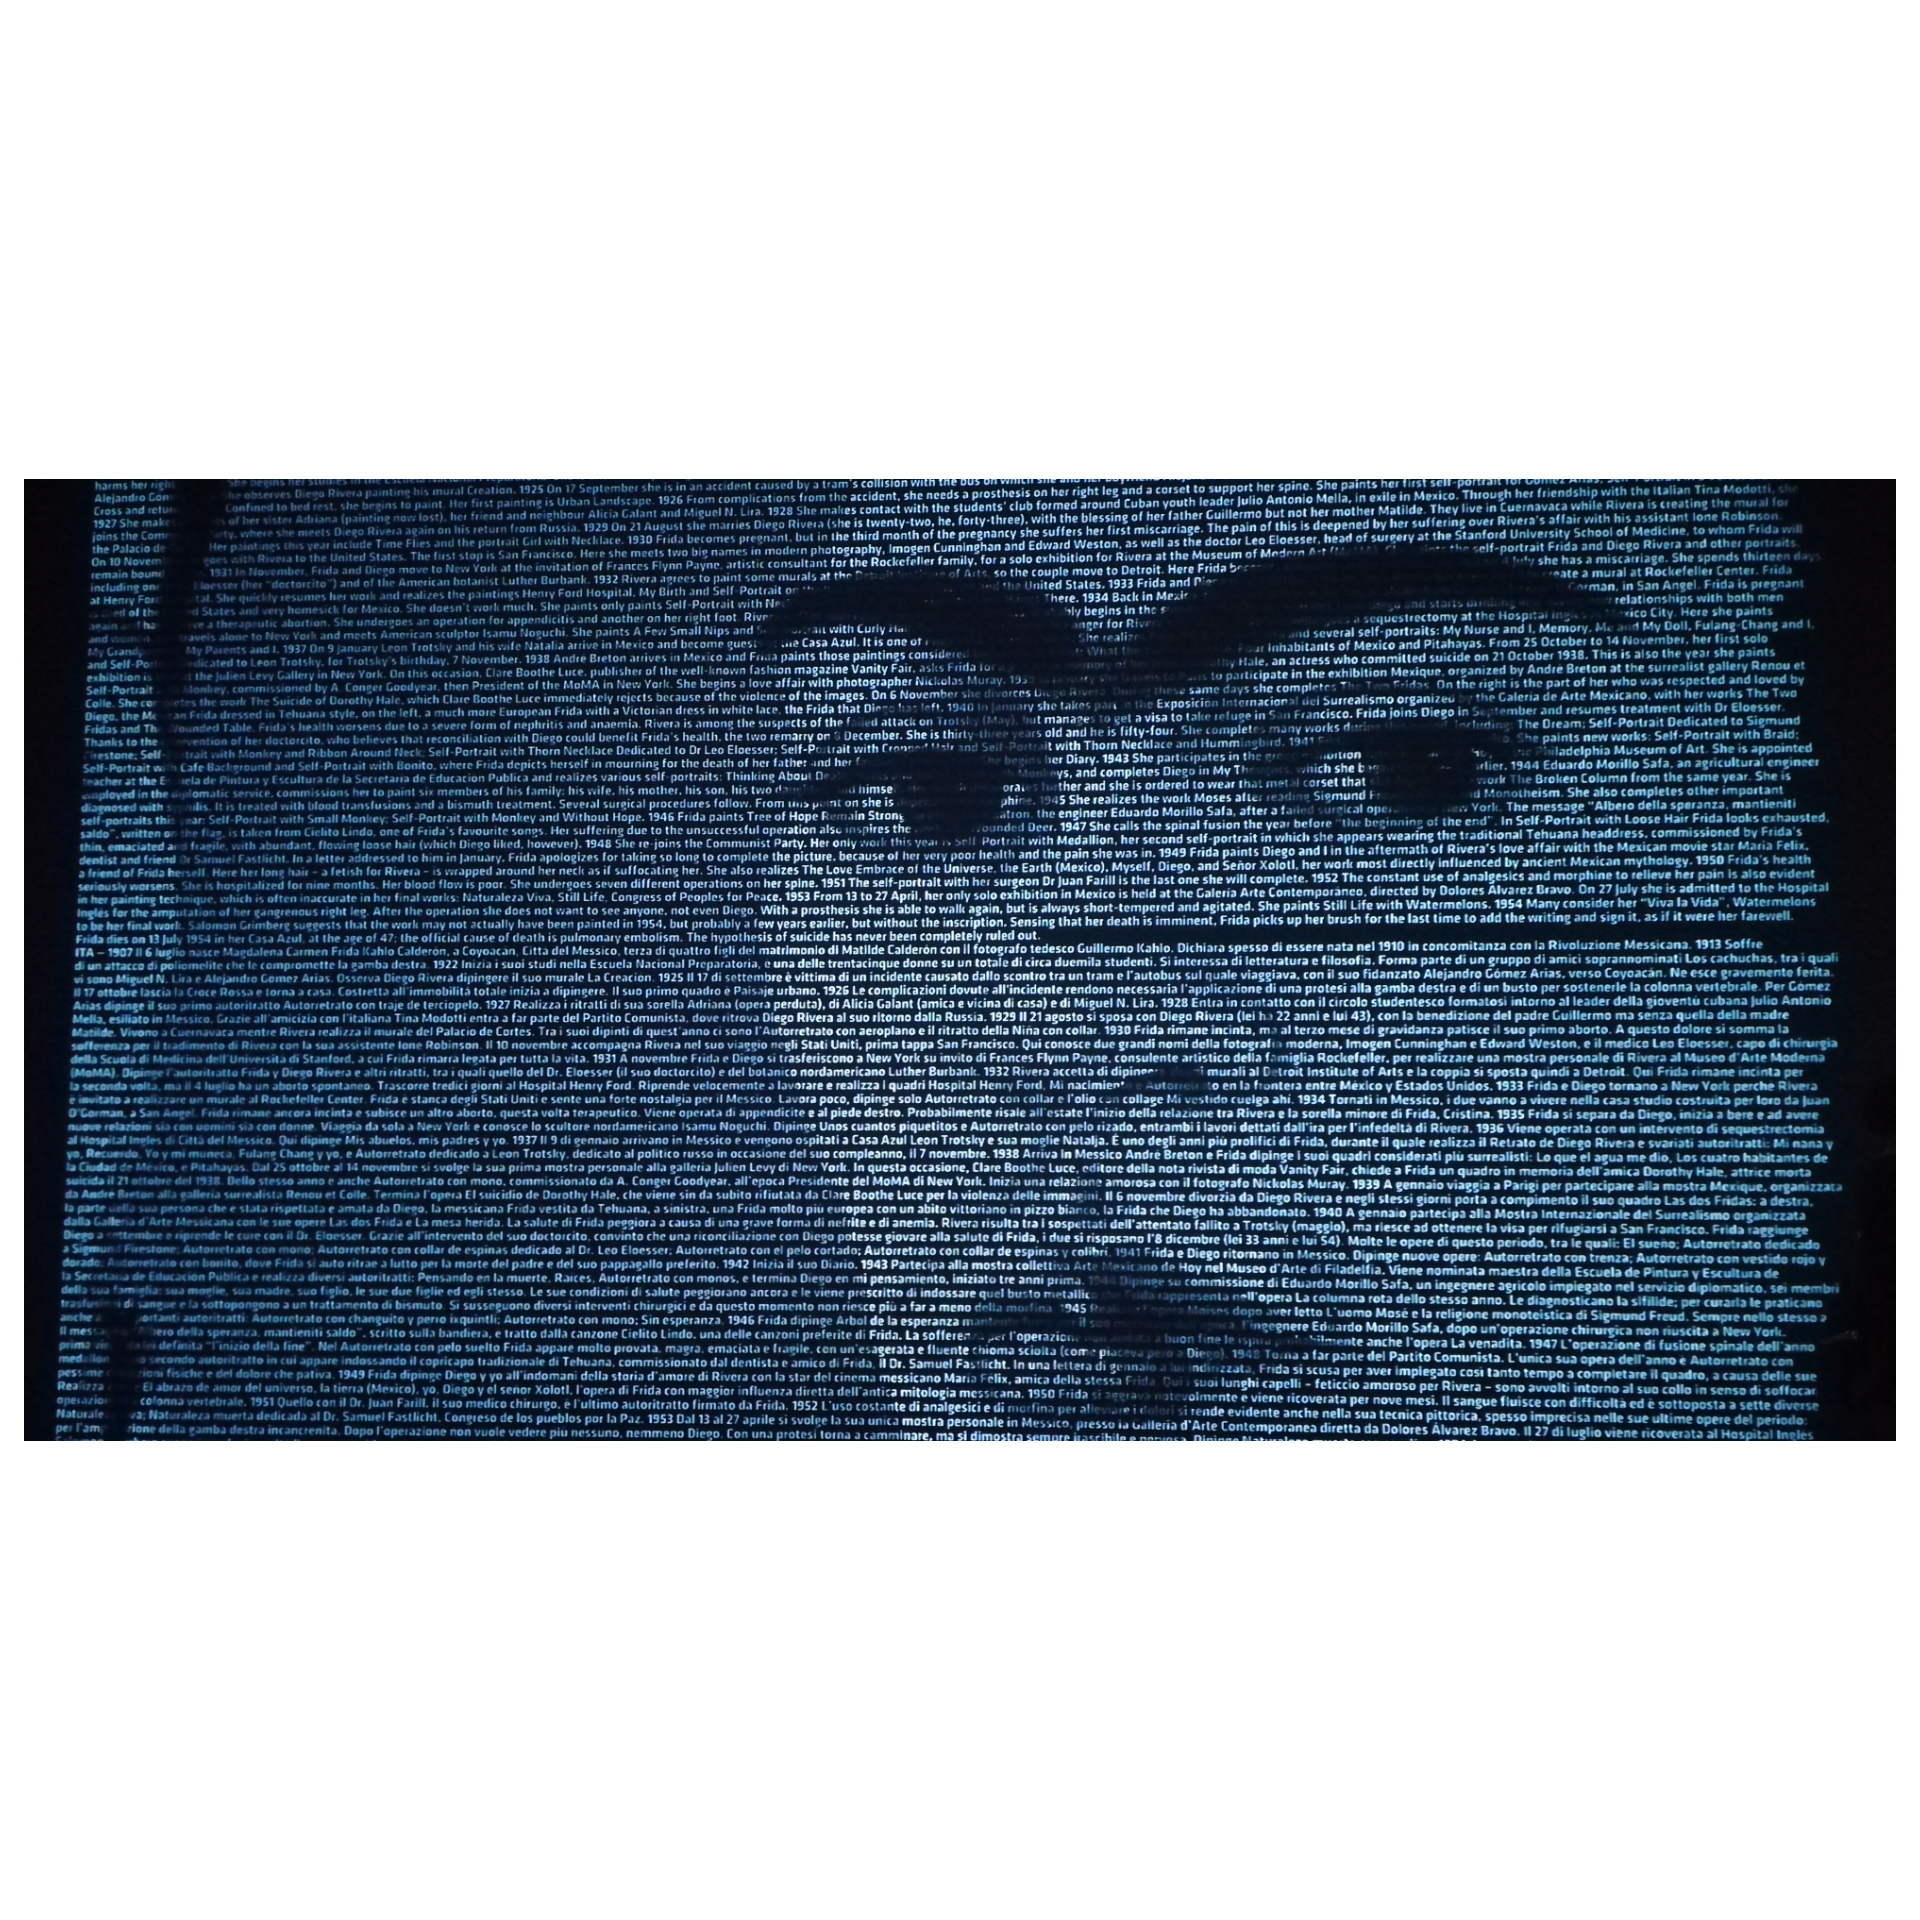 visita alla mostra dedicata a Frida Khalo a Milano